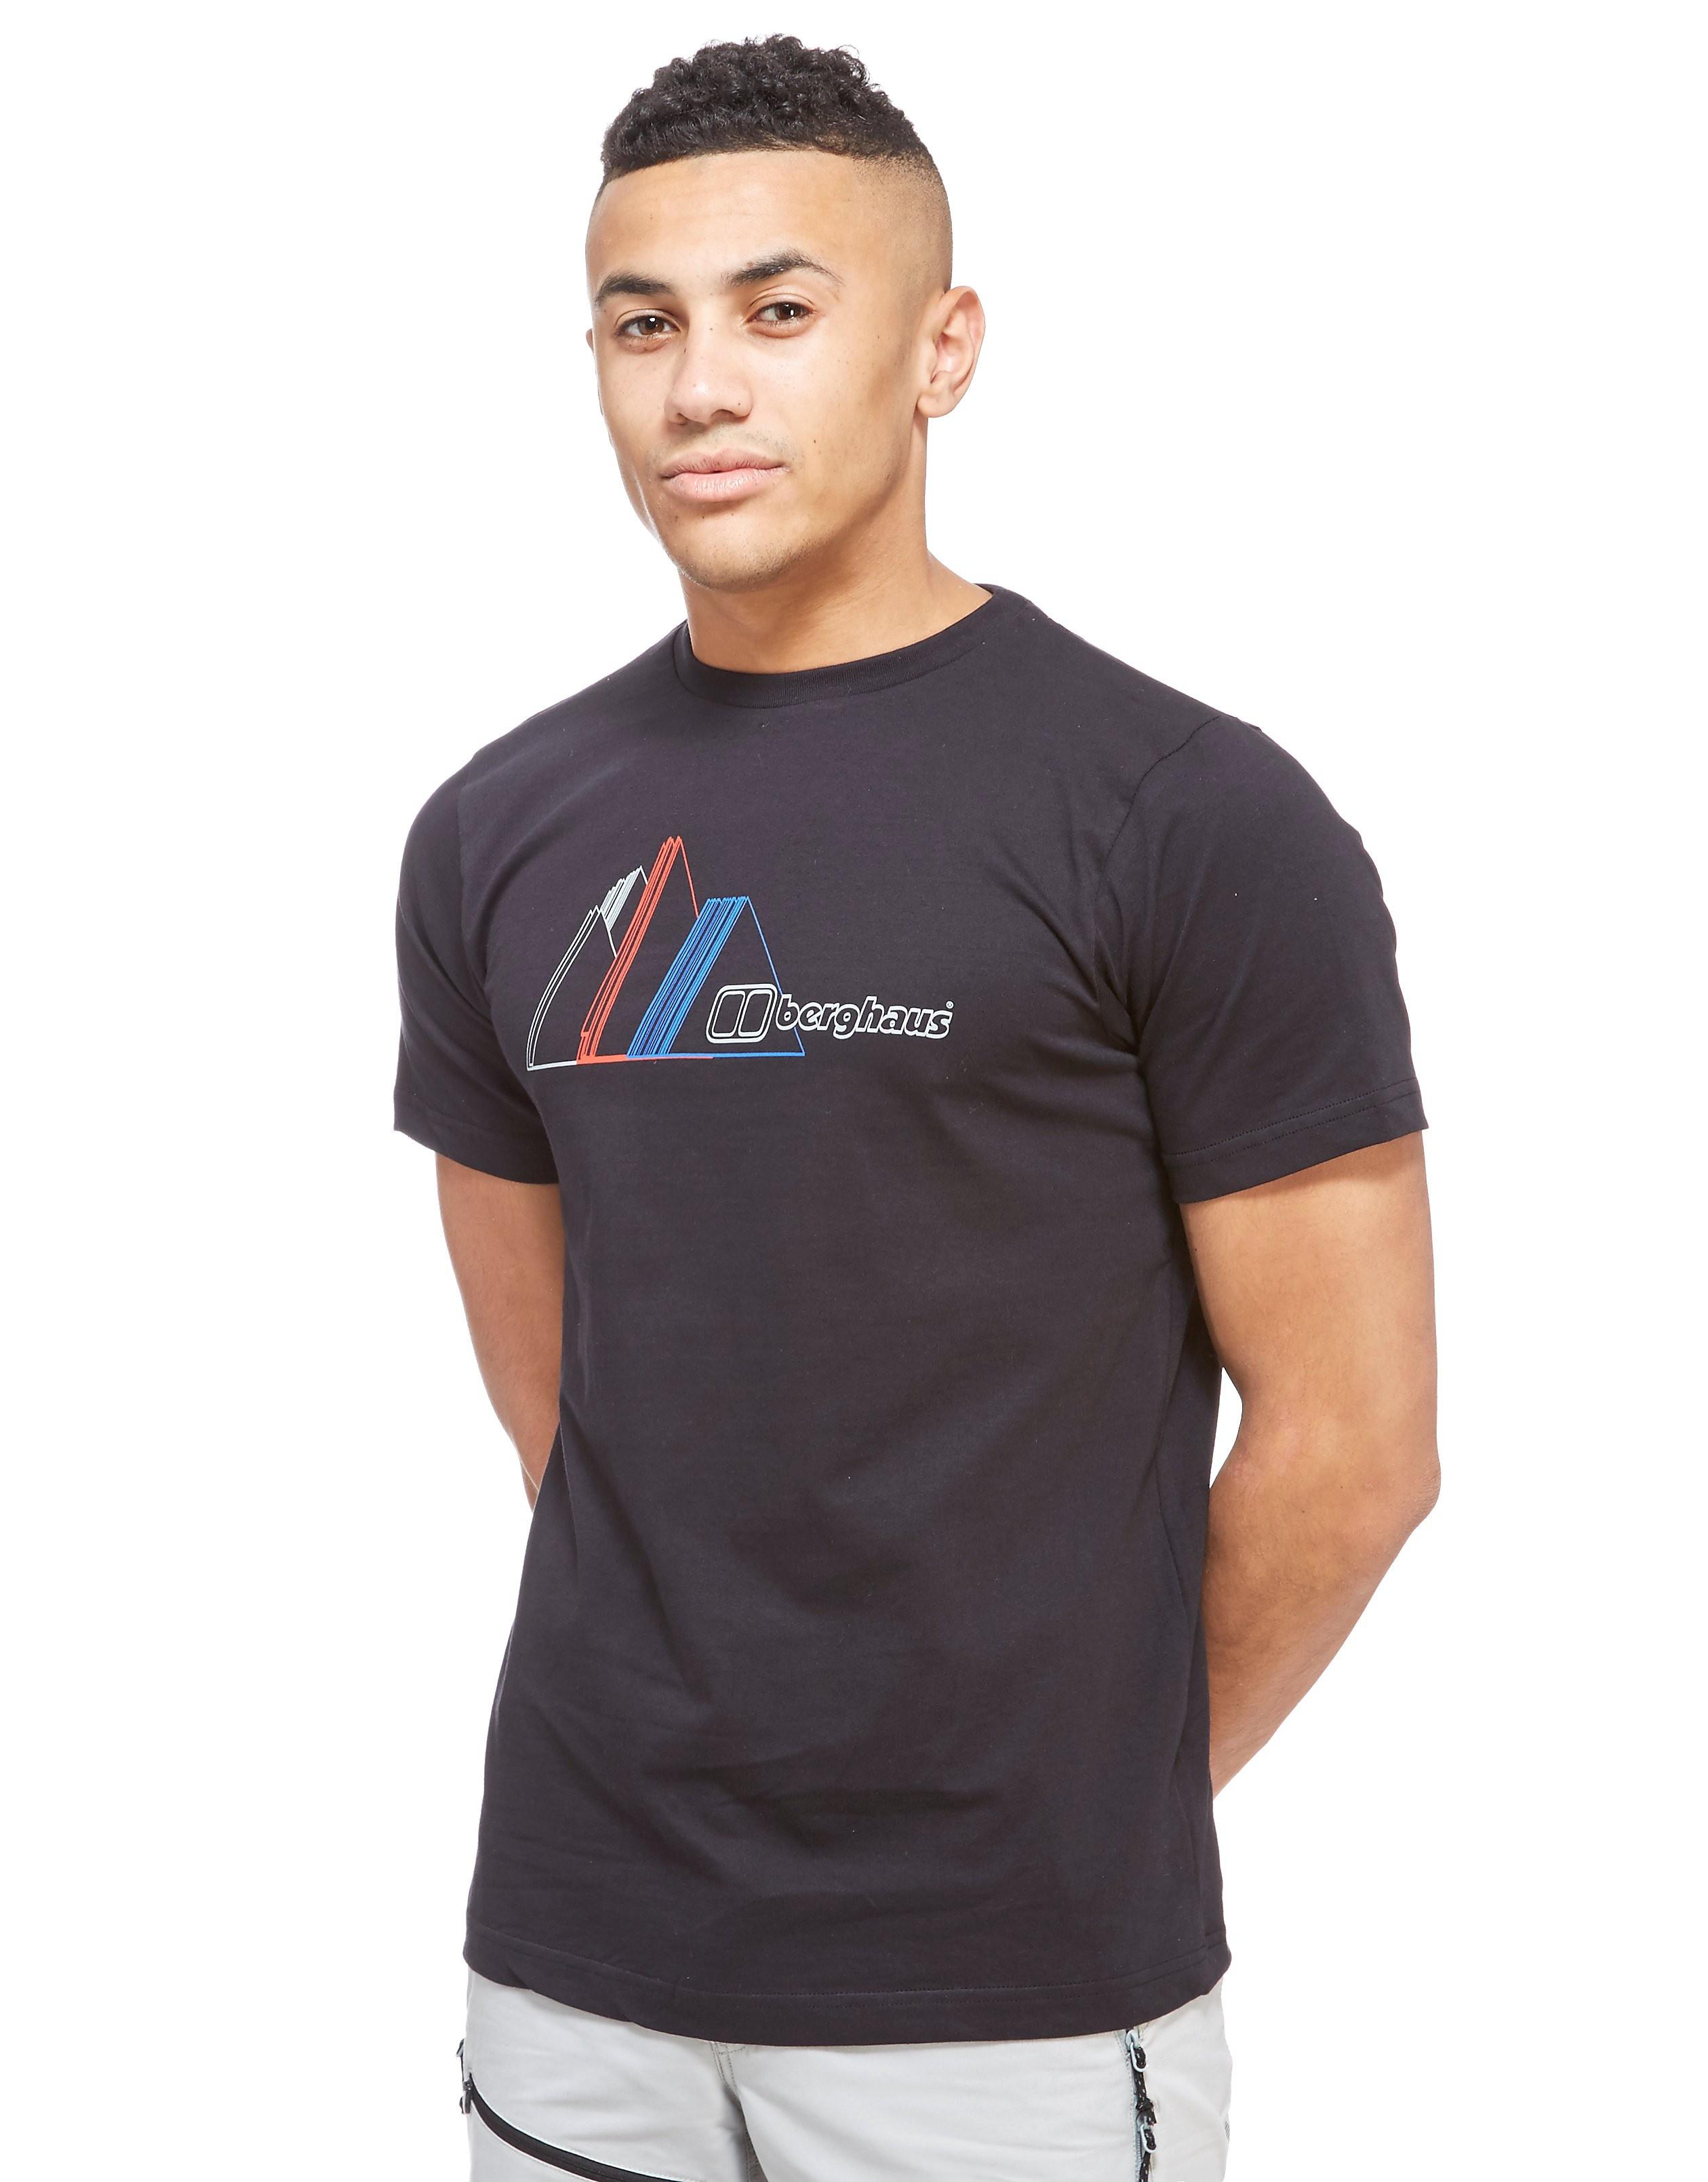 Berghaus Mountain 14 T-Shirt